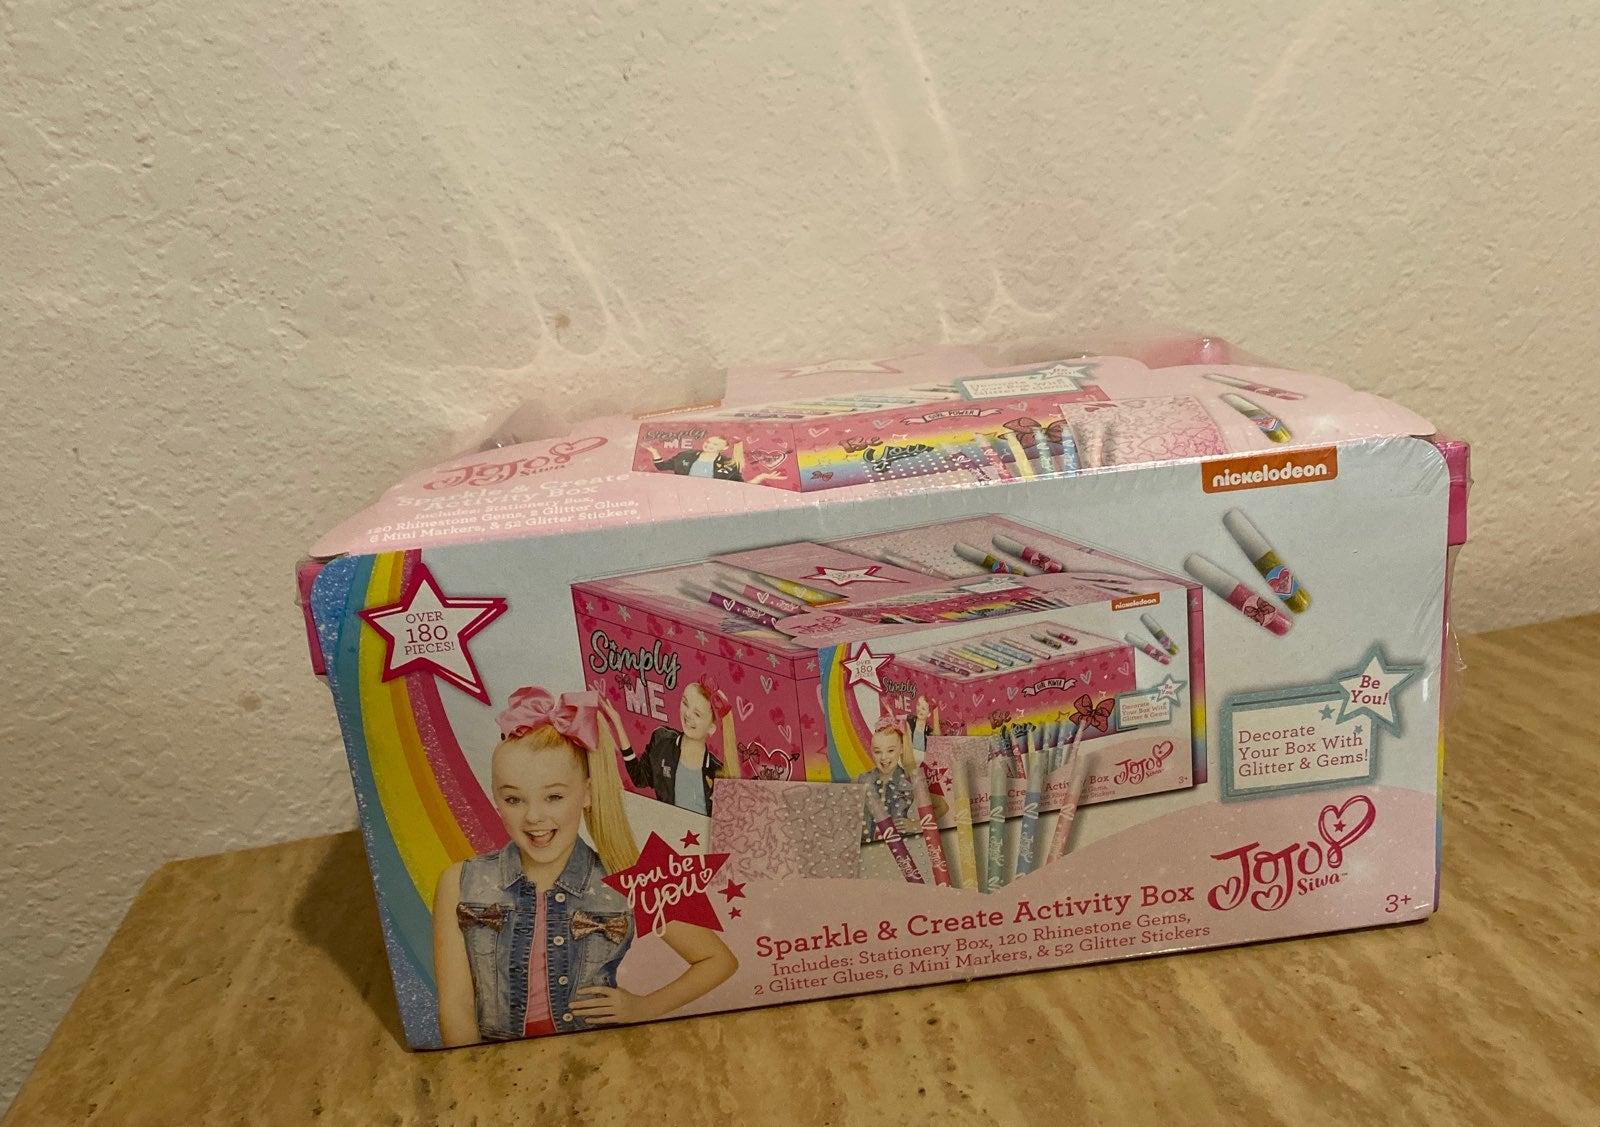 JoJo Siwa Sparkle & Create Activity Box